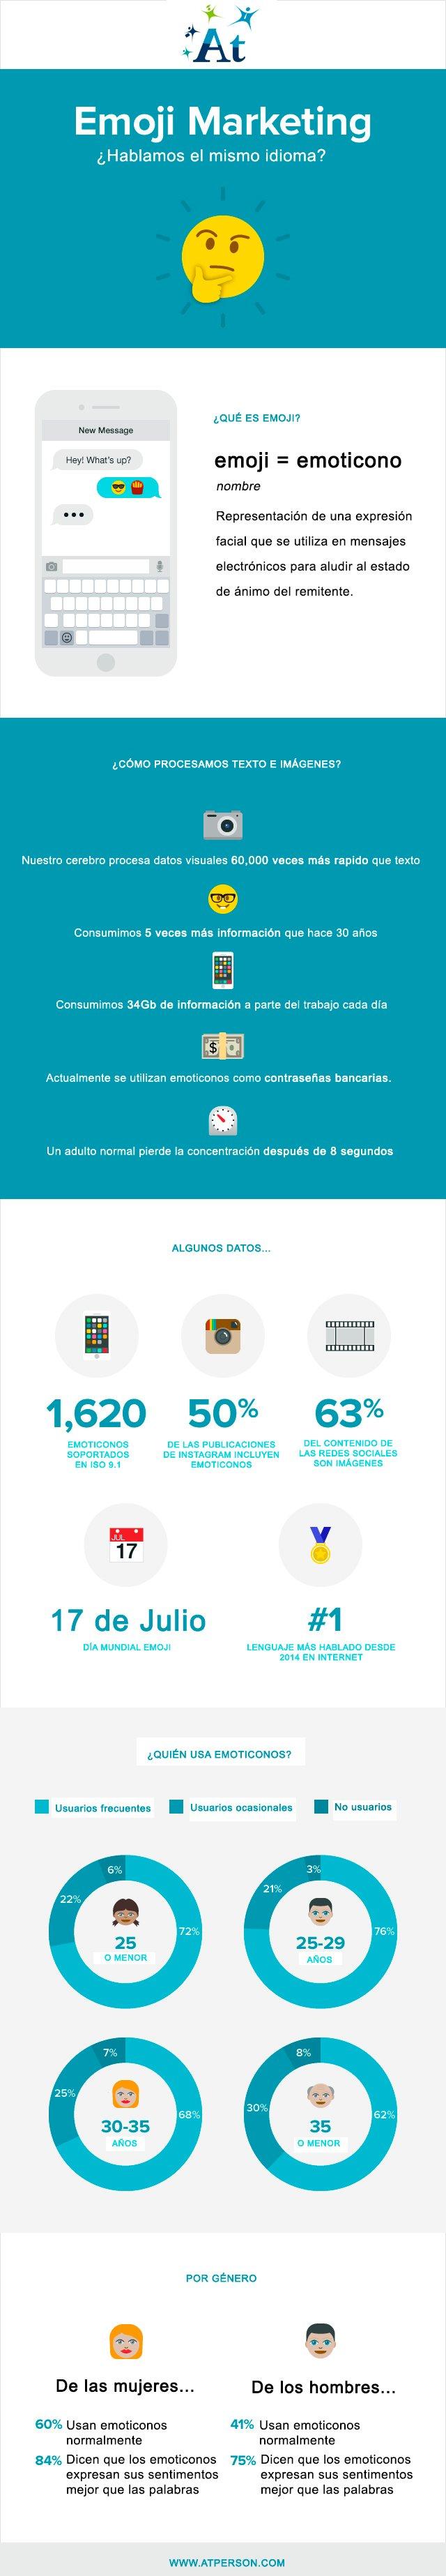 emoji marketing infografia